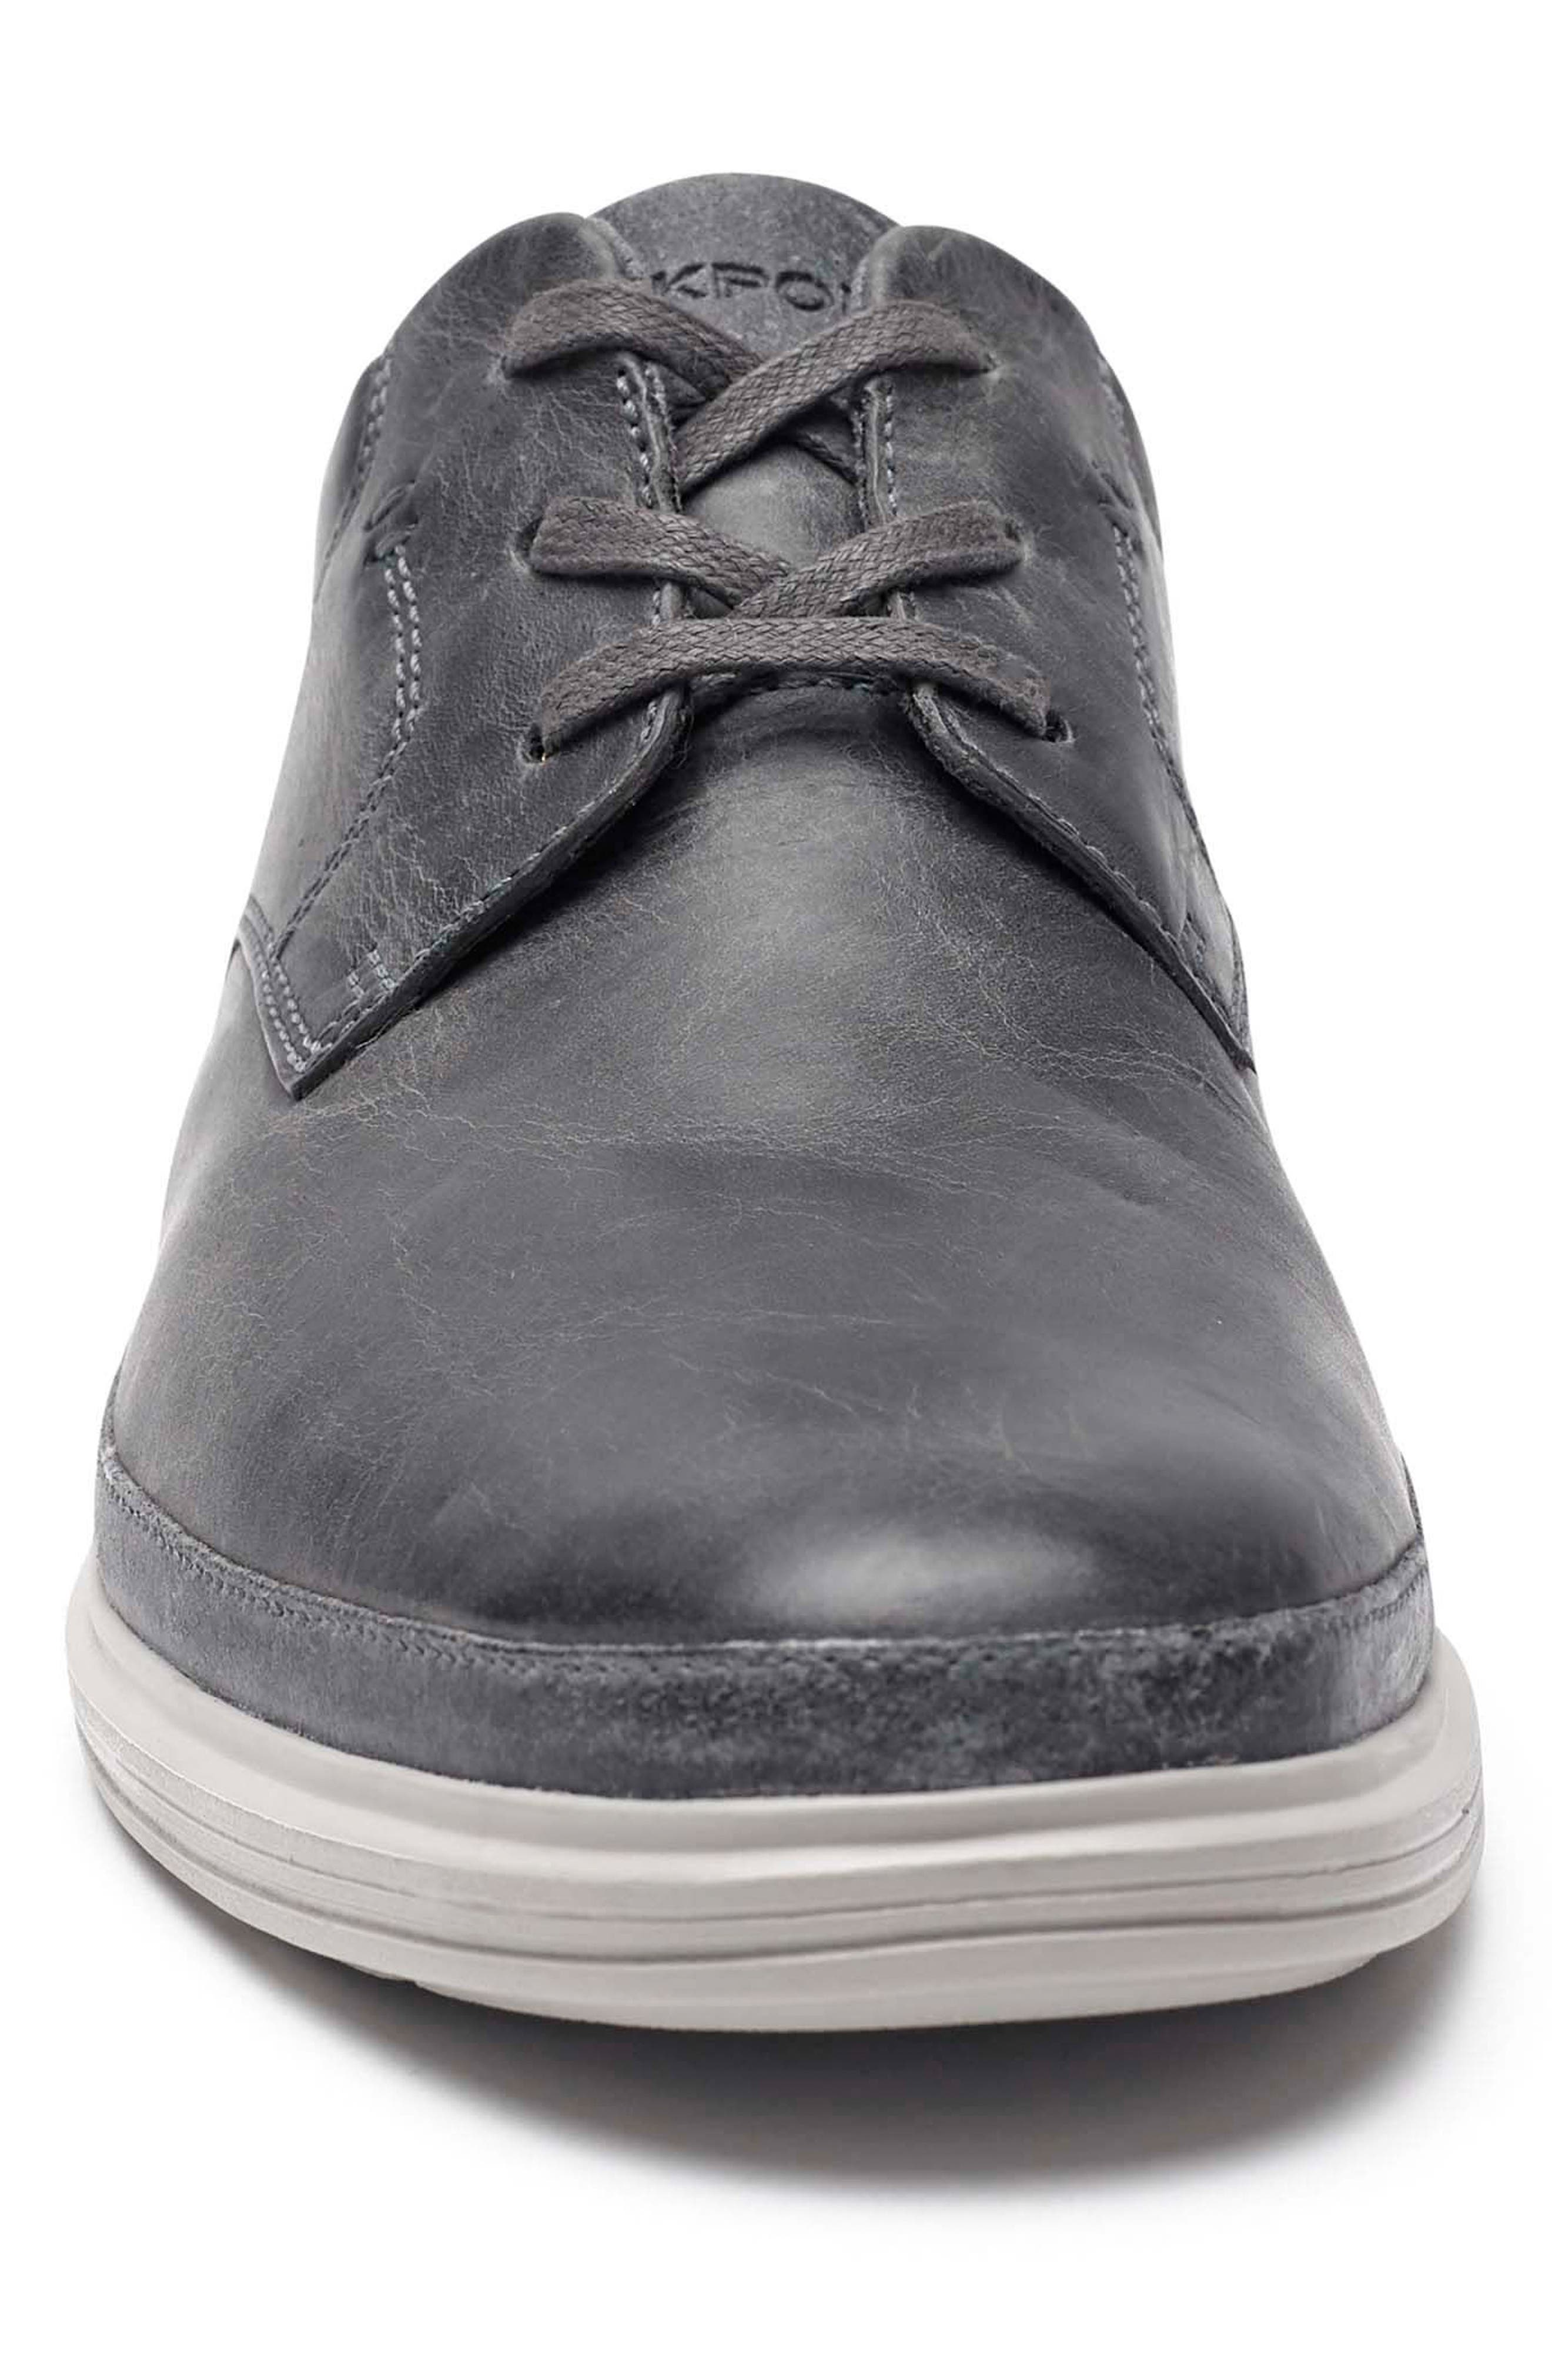 Dressports 2 Go Plain Toe Derby,                             Alternate thumbnail 4, color,                             Grey Leather